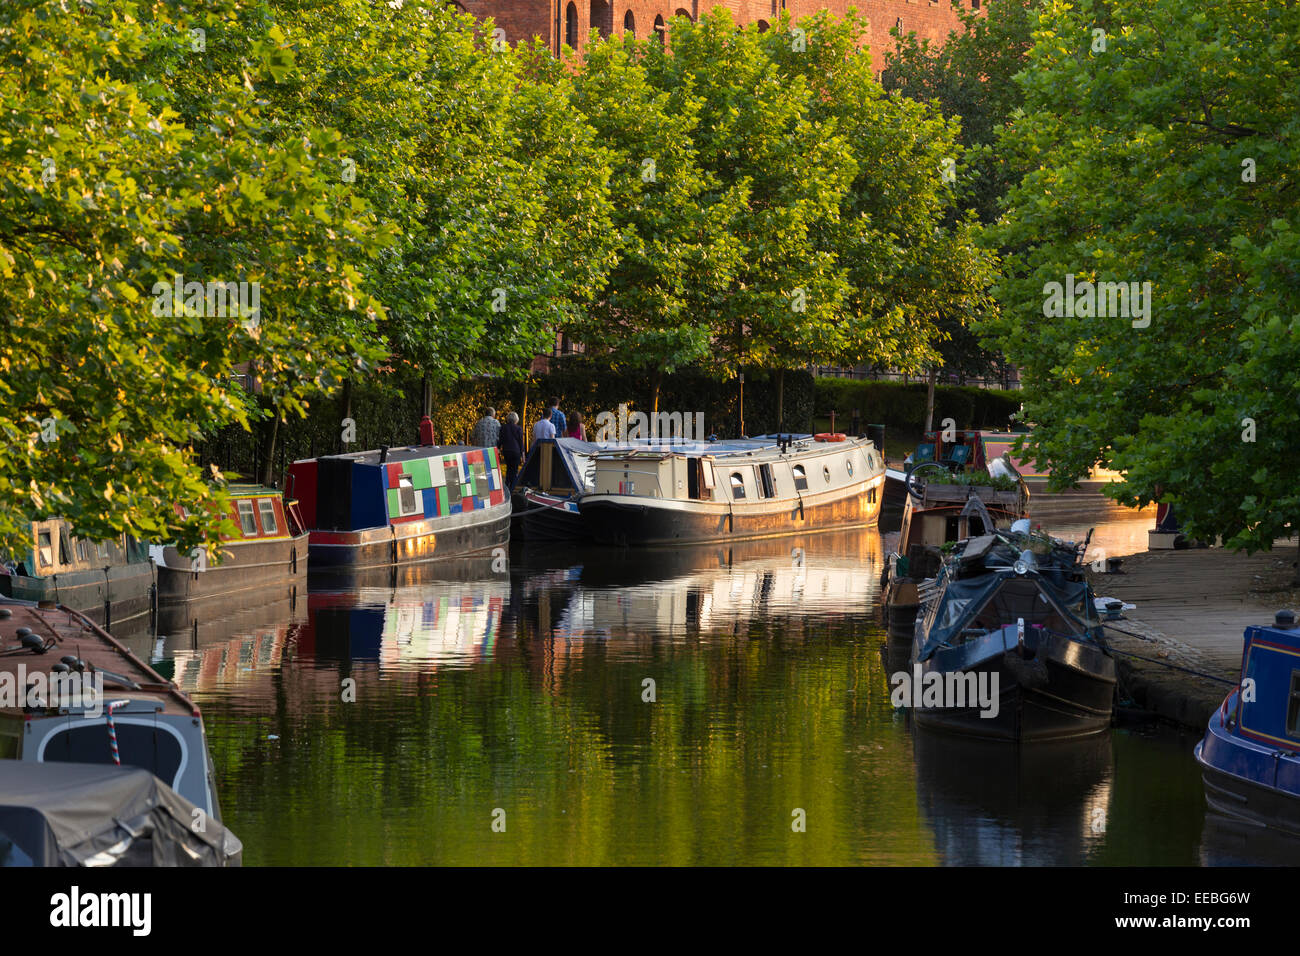 England, Manchester, Bridgewater Canal - Stock Image